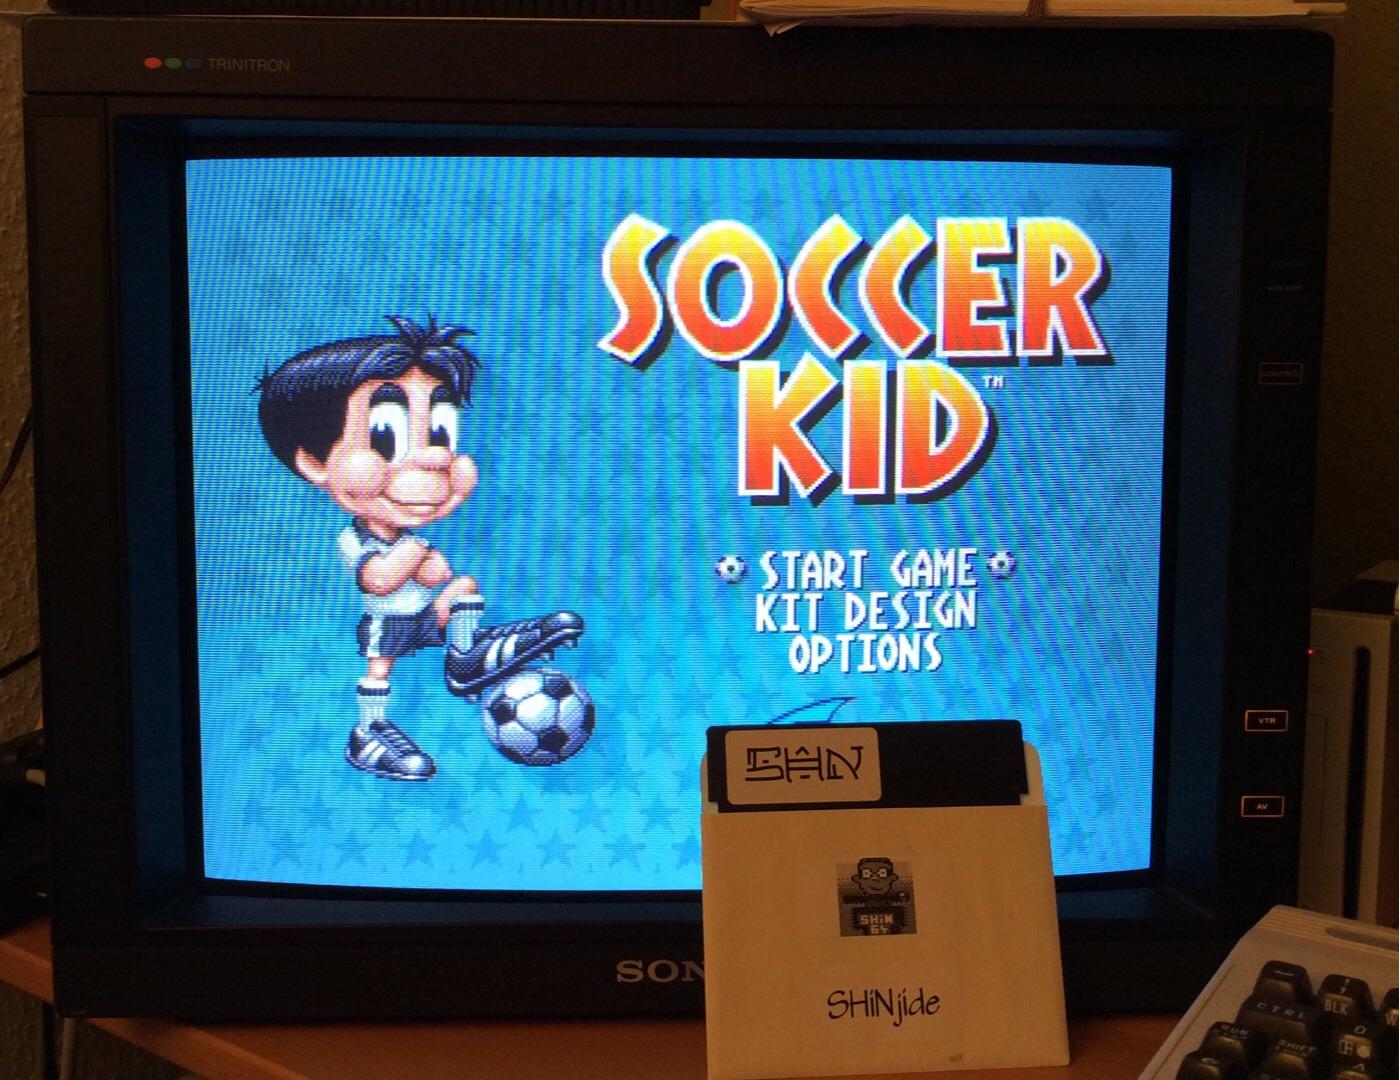 SHiNjide: Soccer Kid (Amiga) 58,450 points on 2014-10-06 01:03:14